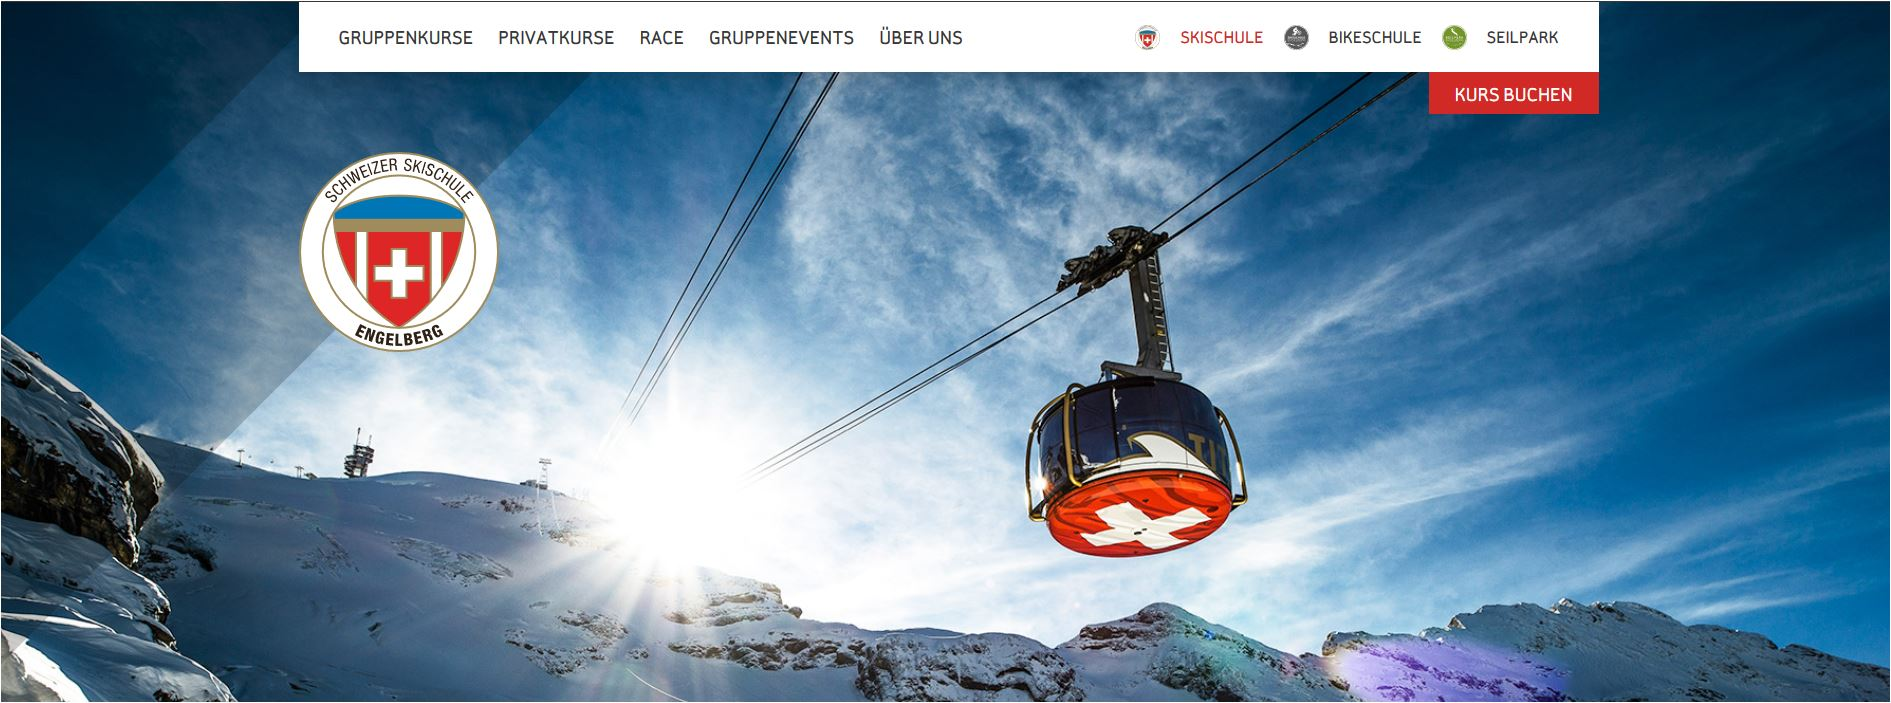 gute skischule schweiz